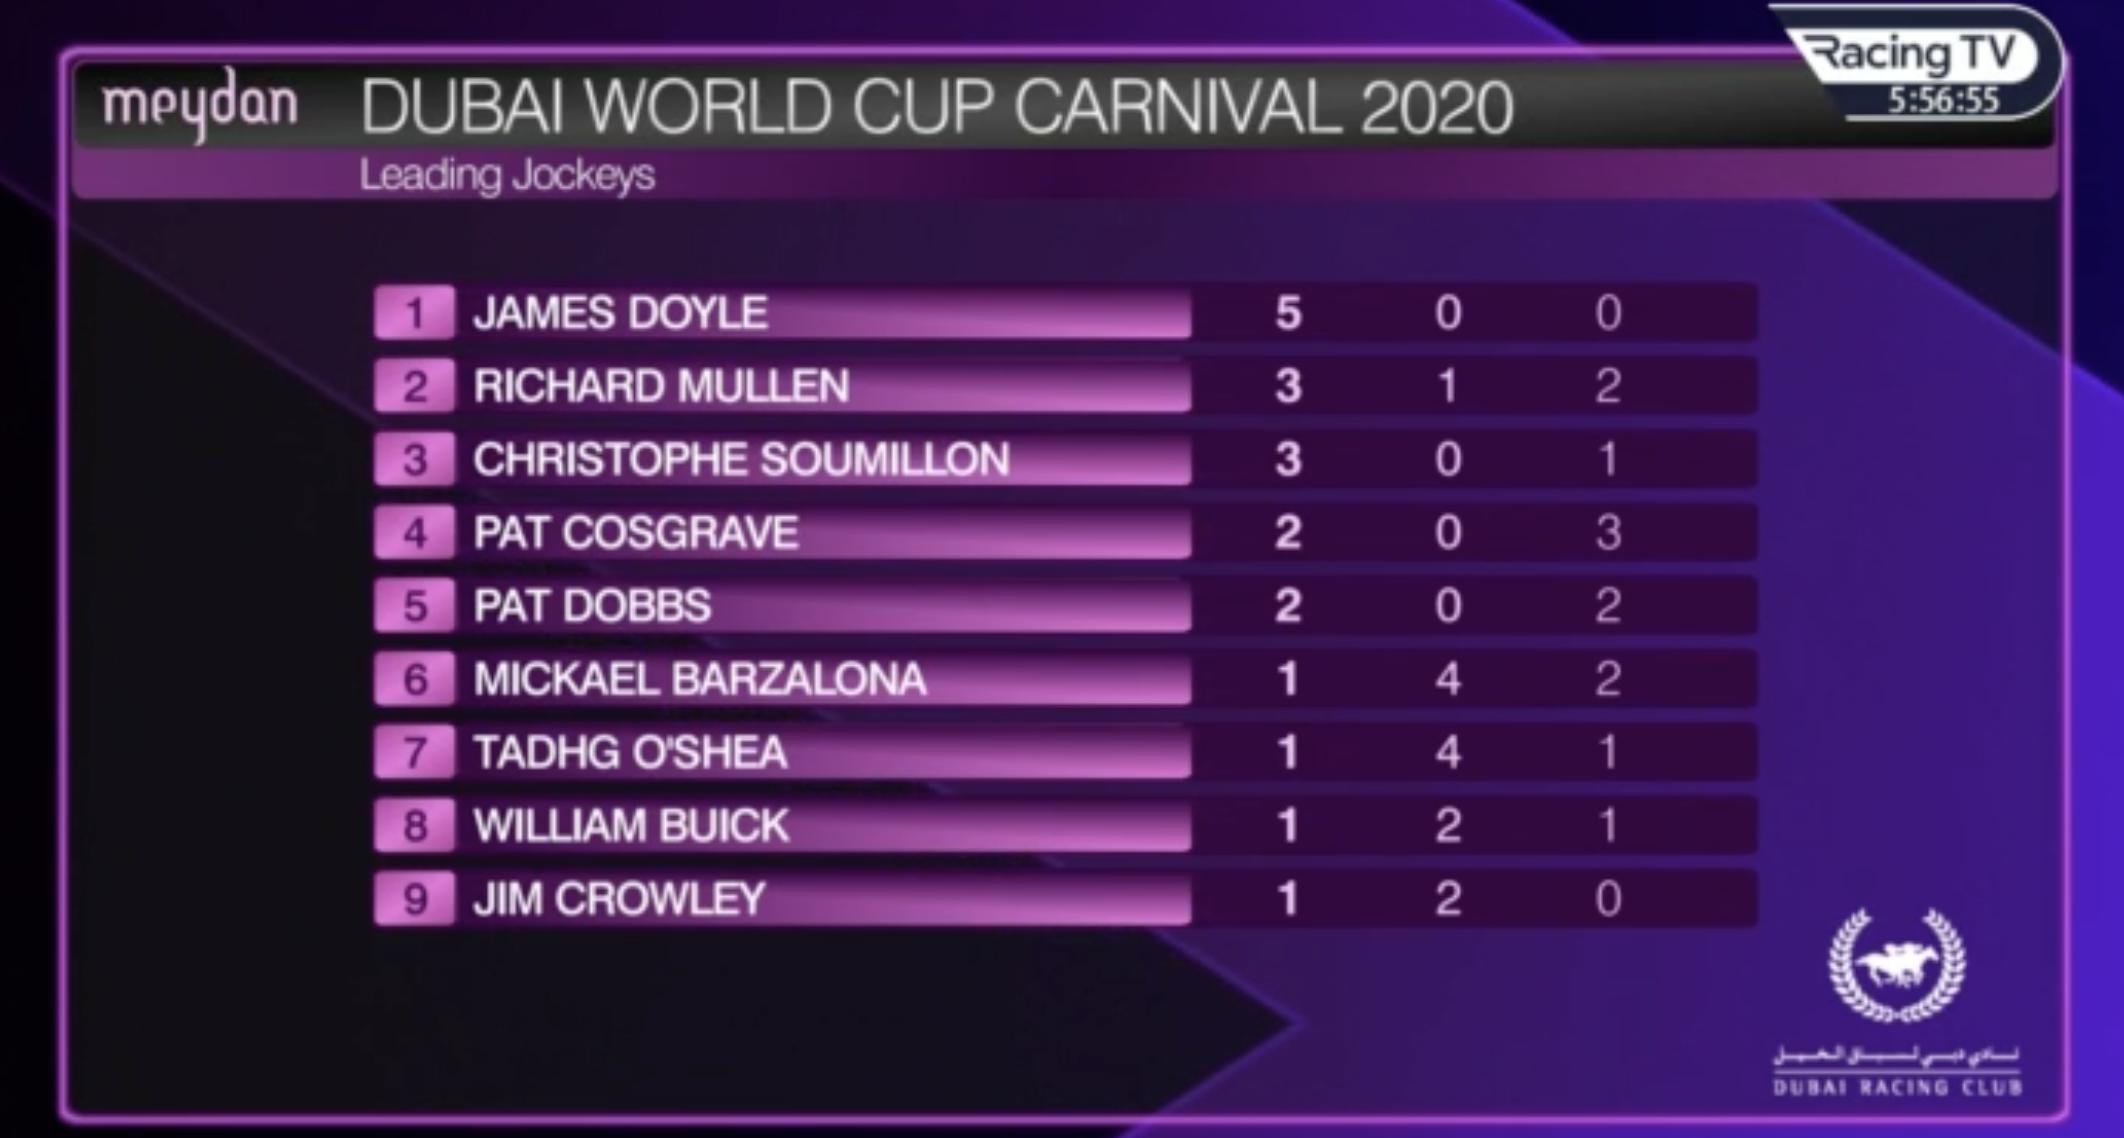 Top Jockeys after week four of the Dubai Carnival